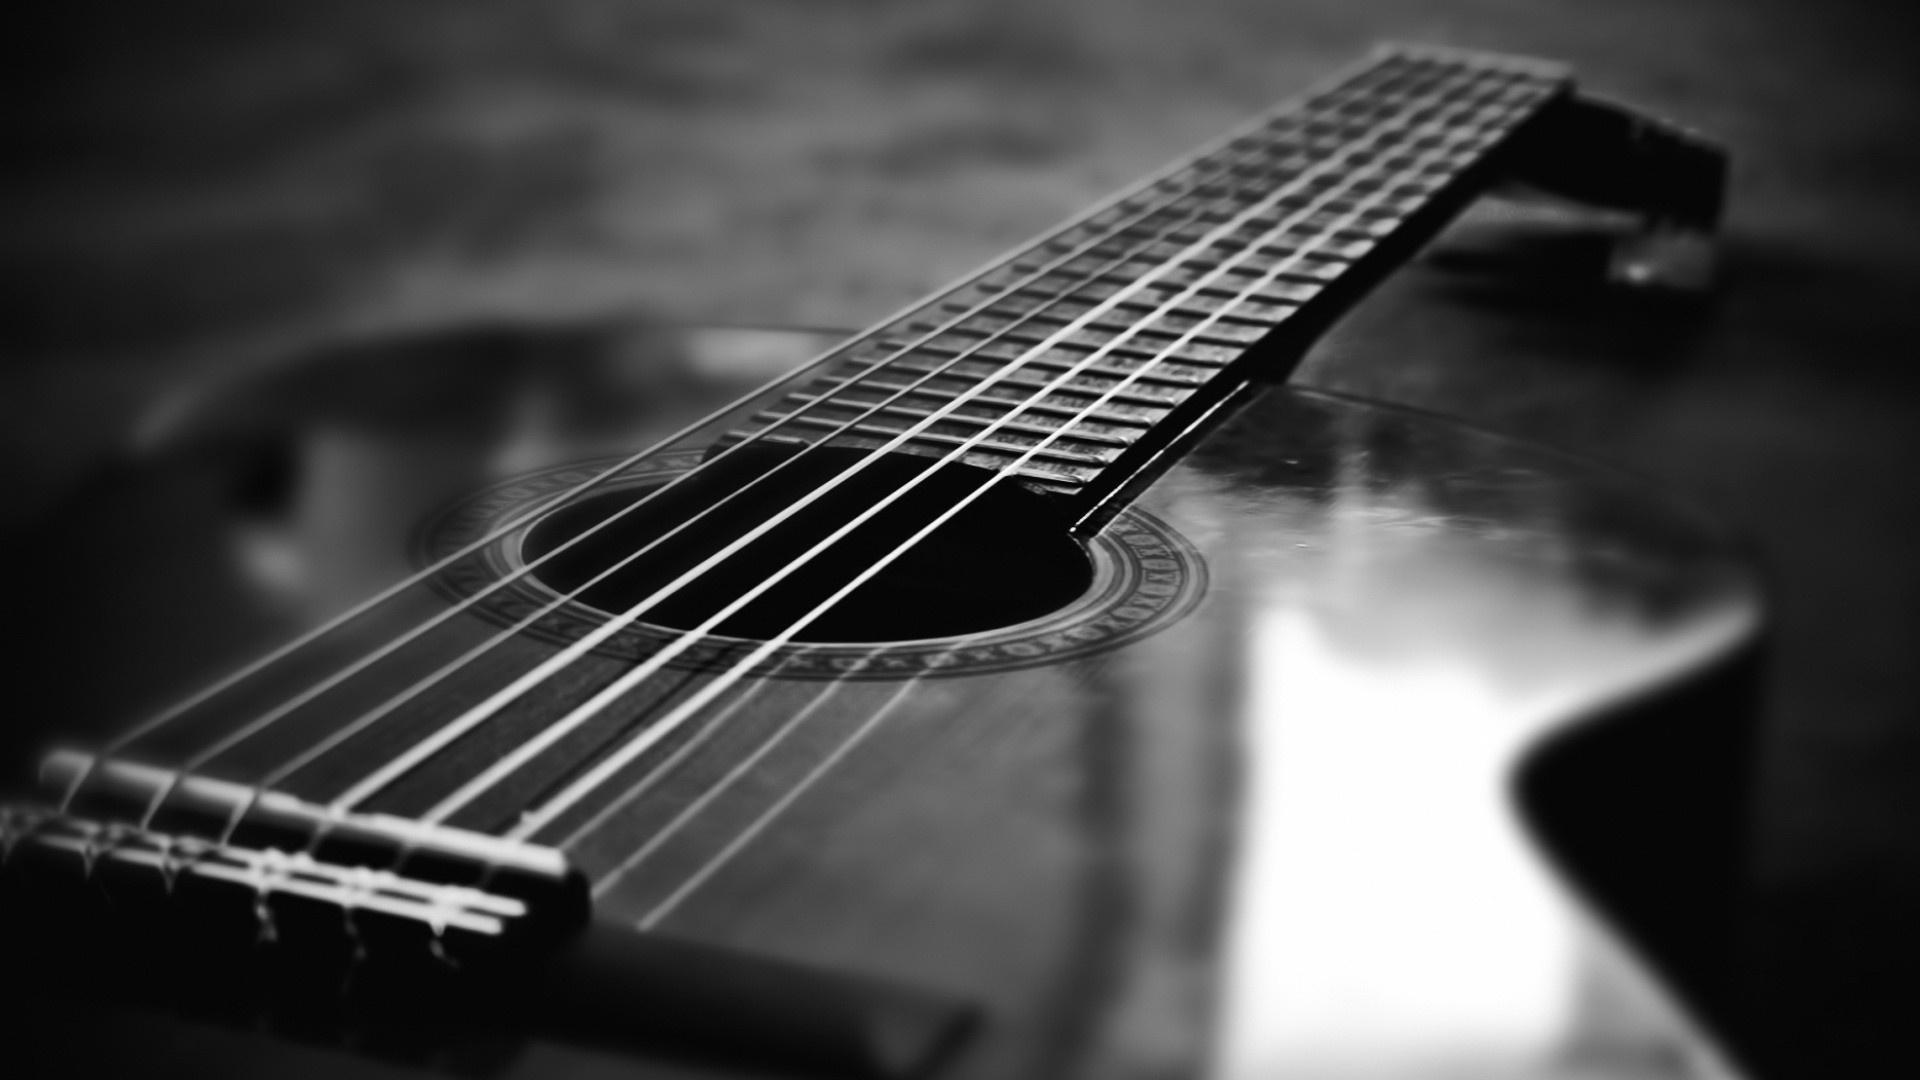 Download Wallpaper Music Guitar - 1126617-large-hd-guitar-wallpaper-1920x1080-high-resolution  Best Photo Reference_572434.jpg